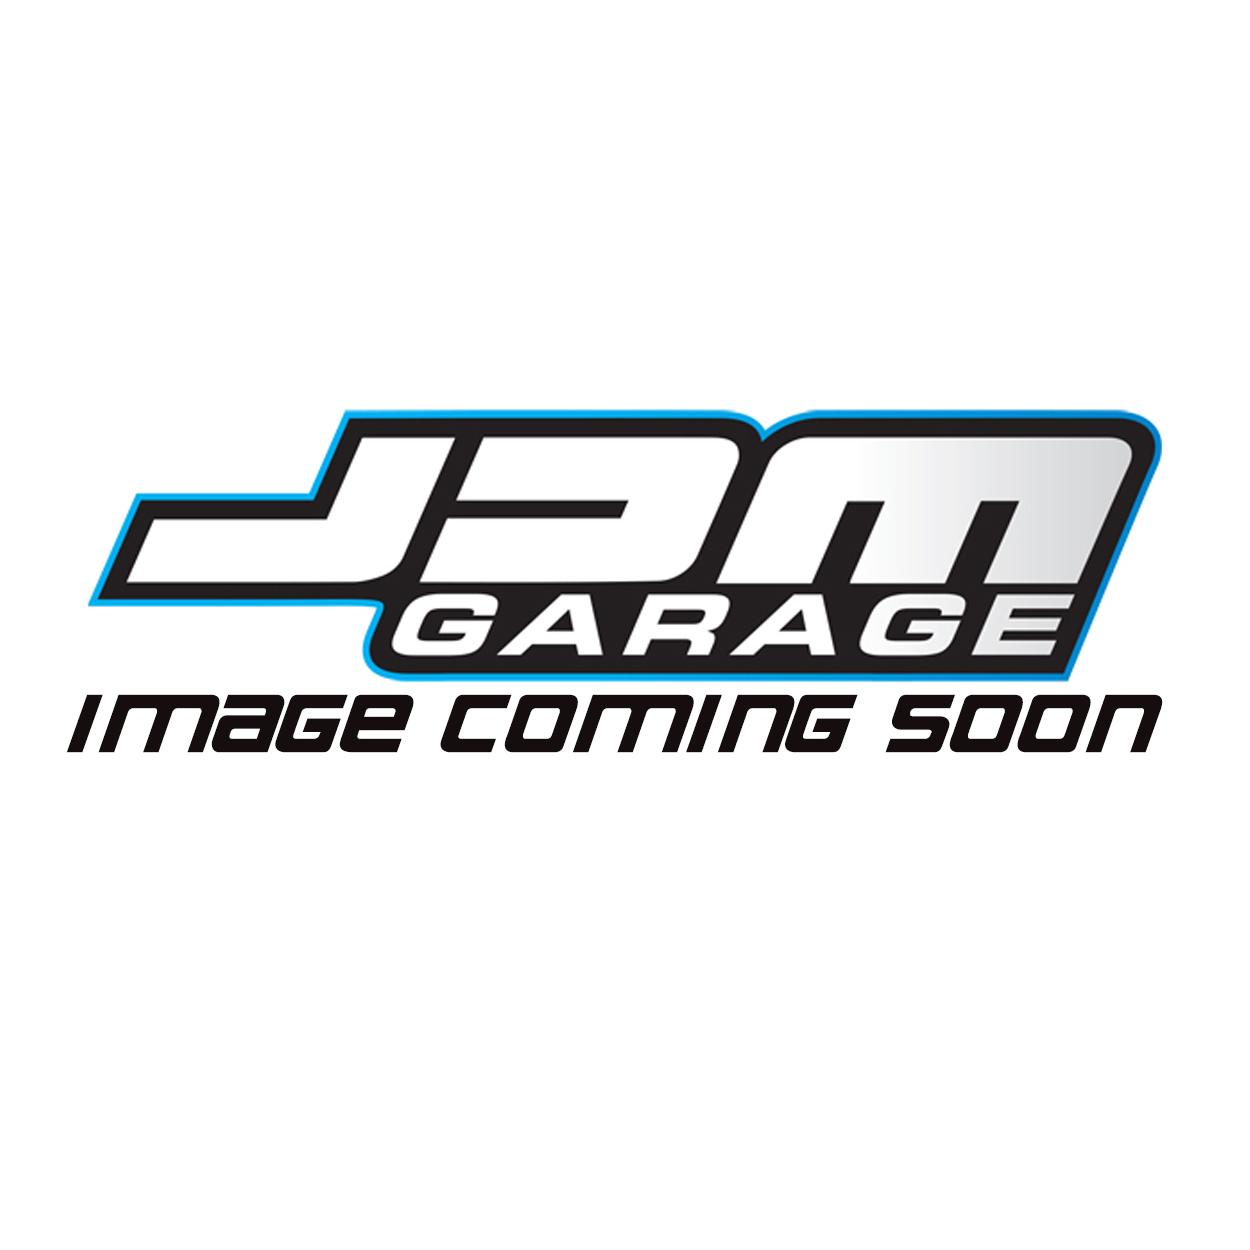 Haltech Elite 2500 + ECU Toyota Supra JZA80 2JZ (non VVTi) With Plug 'n' Play Adaptor Harness Kit